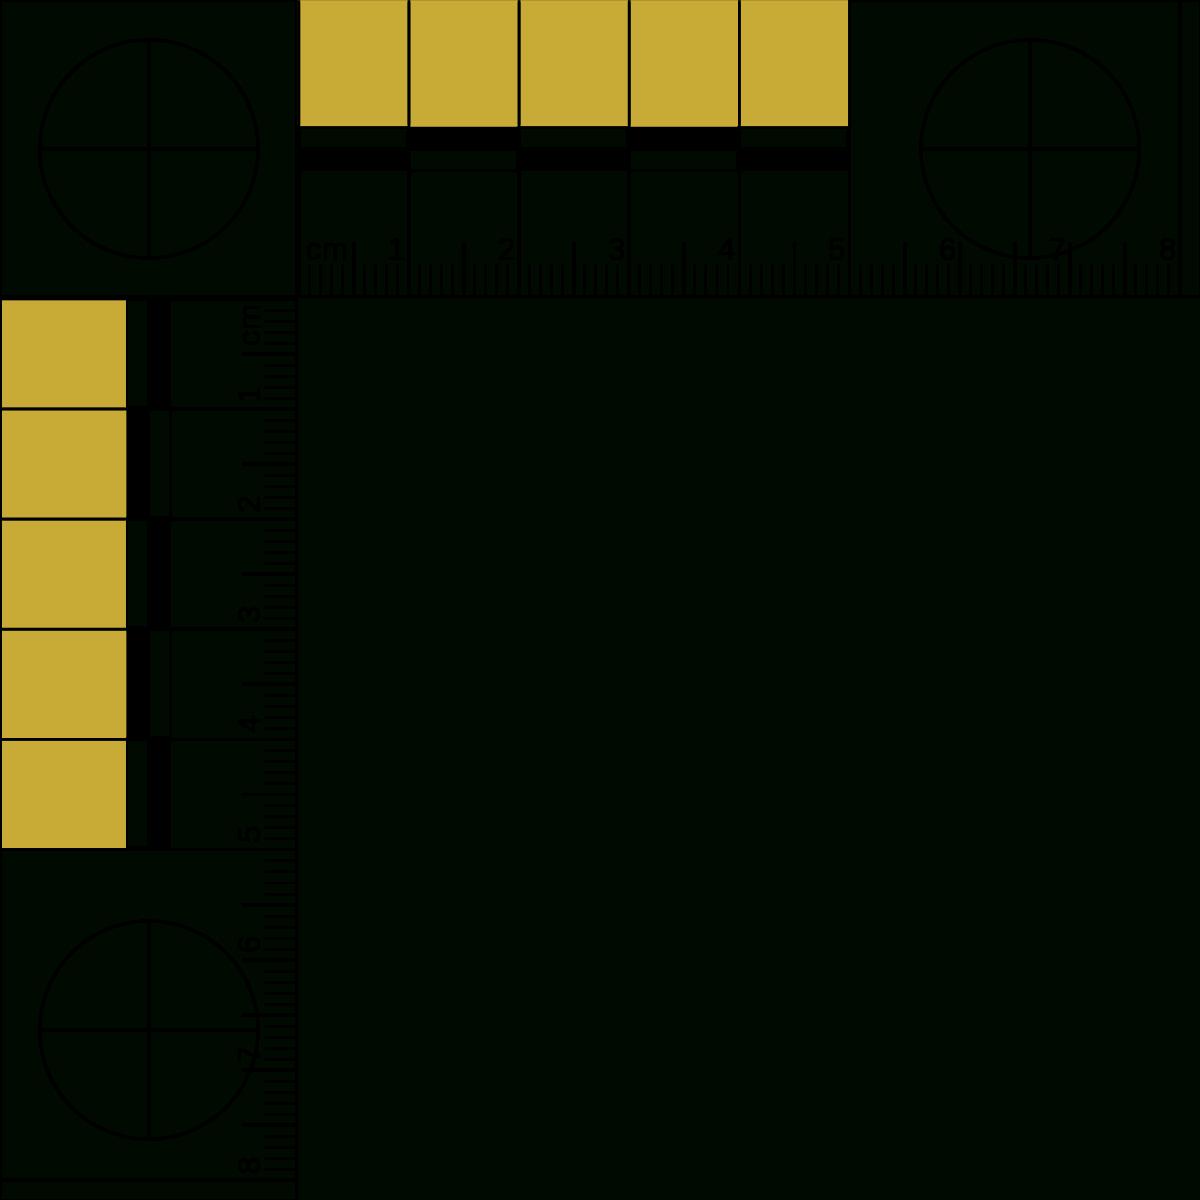 File:50 Mm L Ruler Ty.svg - Wikipedia